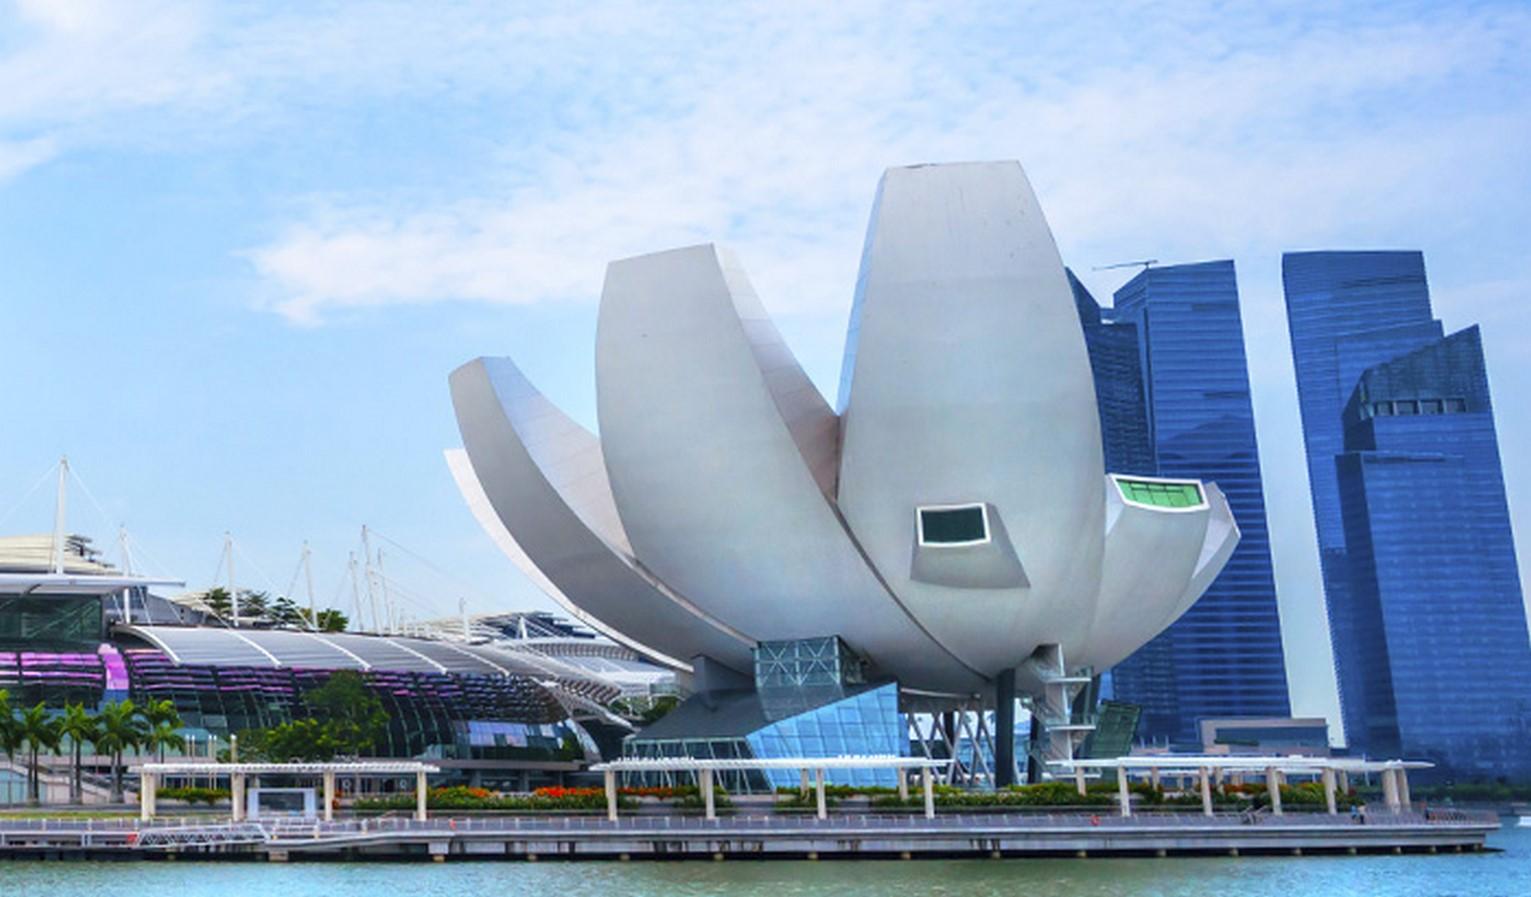 Marina Bay Sands in Singapore. - Sheet1